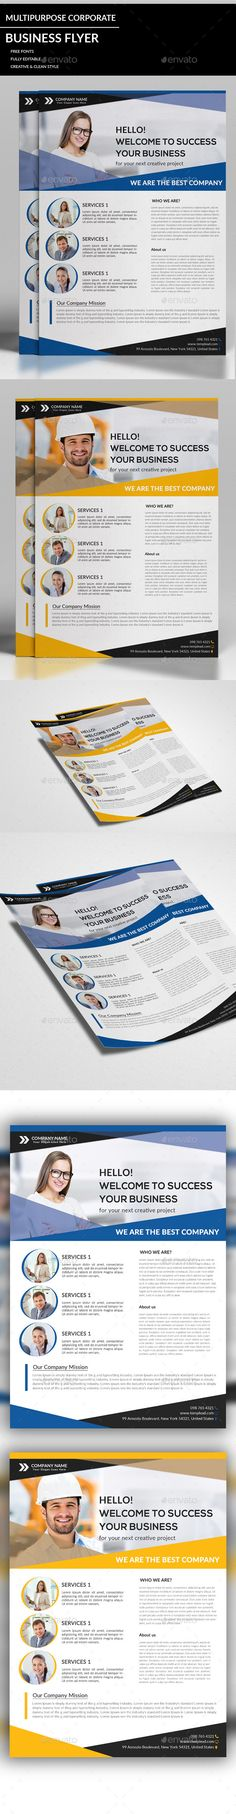 Multipurpose Business Flyer PSD Template #design Download: http://graphicriver.net/item/multipurpose-business-flyer/12707351?ref=ksioks